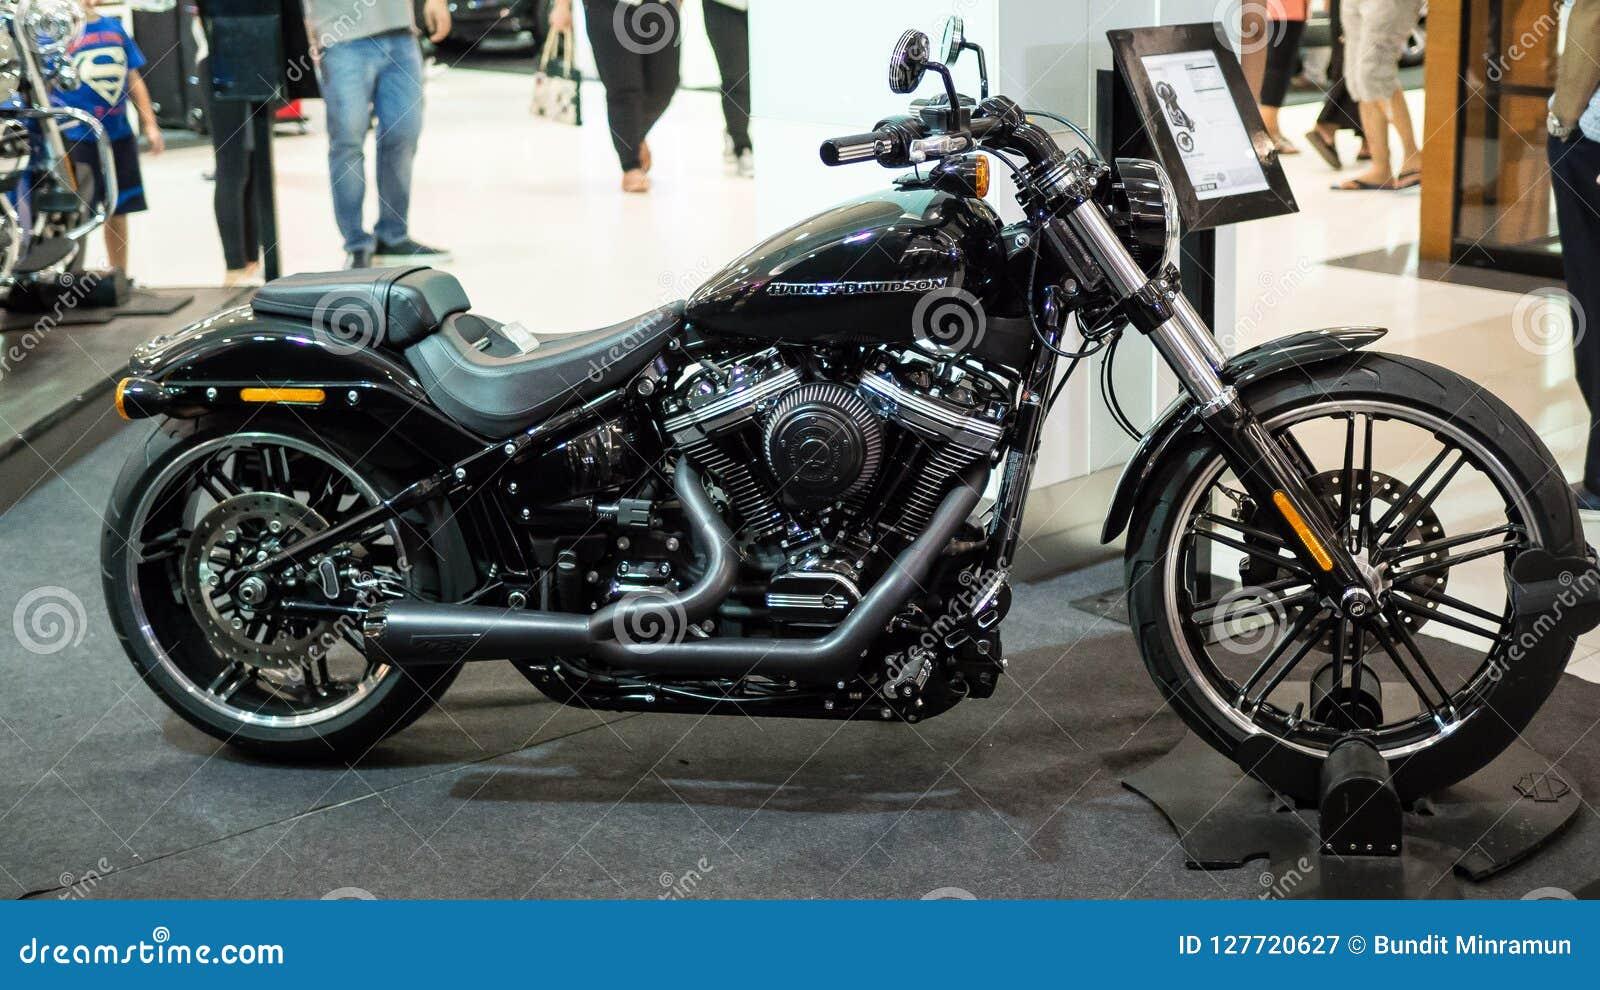 Motorcycle Harley Davidson breakout displaying at Motor Show.